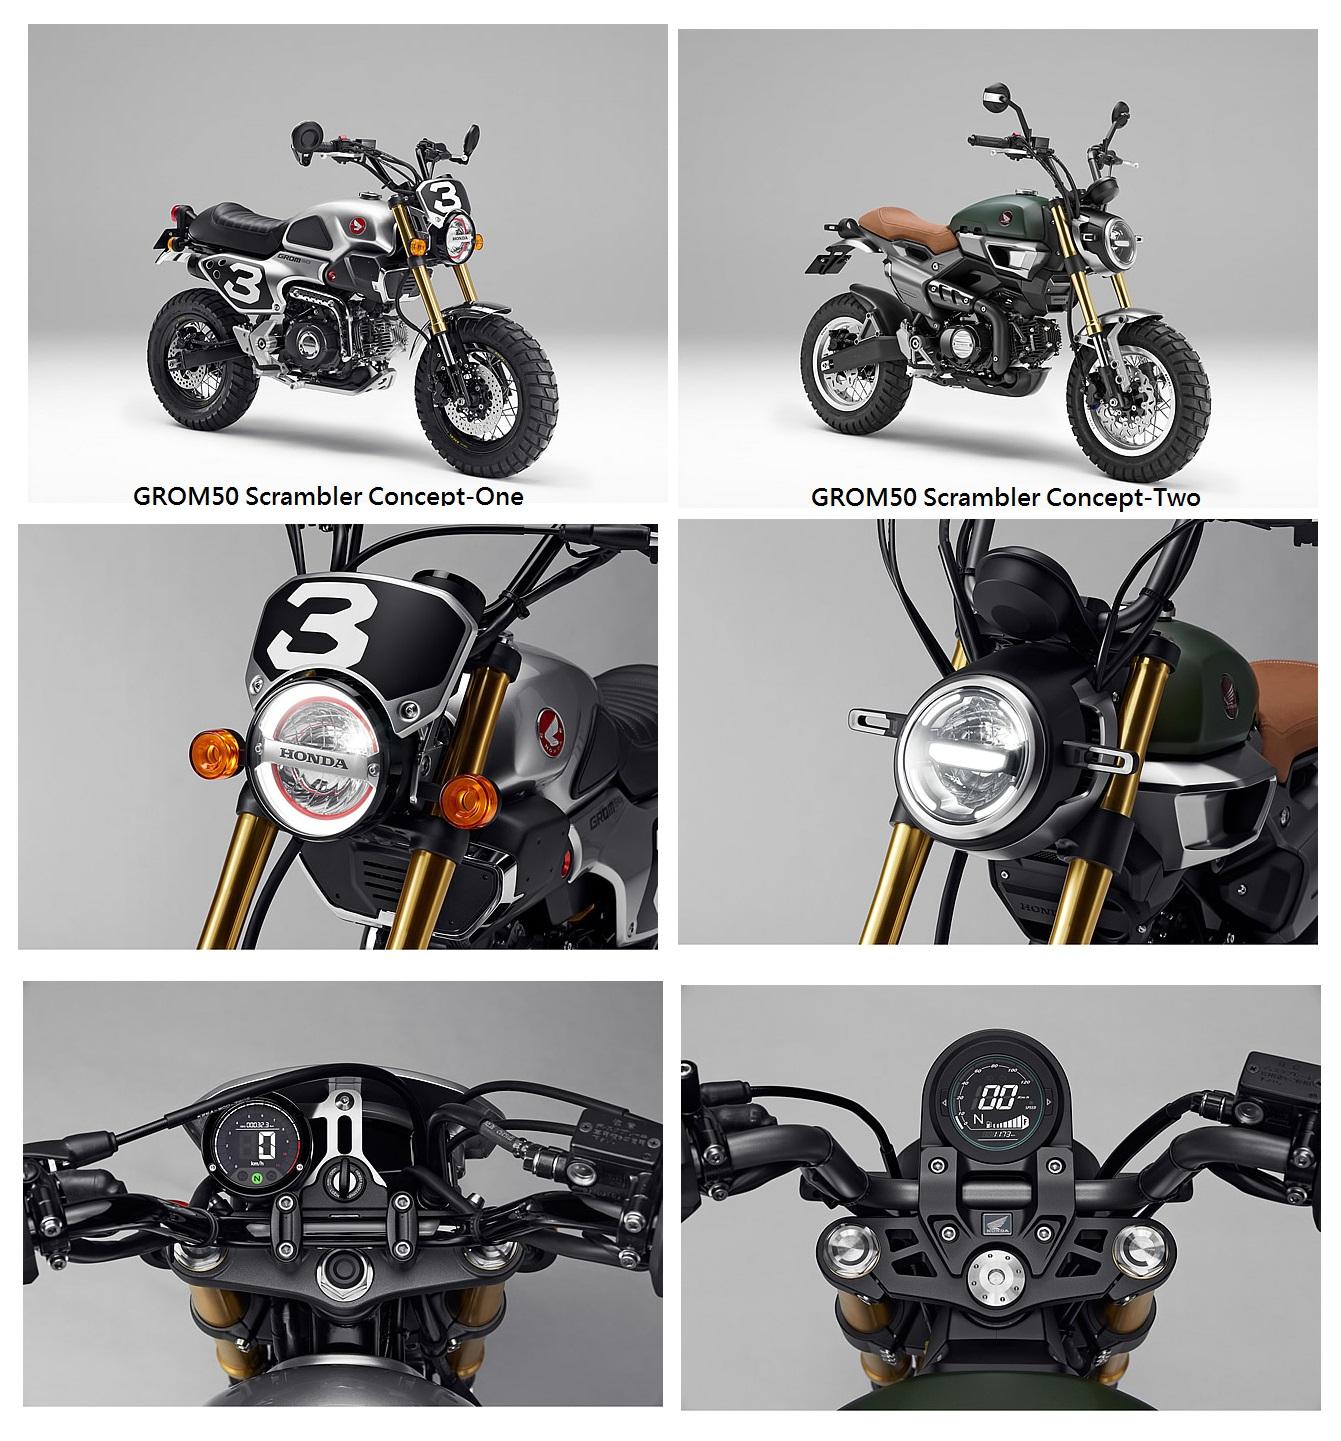 2016 Honda Grom 50 Scrambler Concept Motorcycles / Bikes